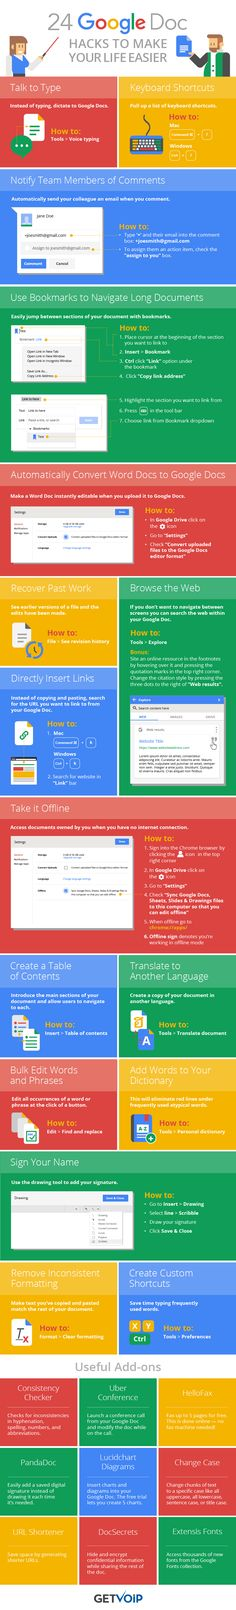 24 Google Docs Hacks That Make Your Life Easier [Infographic]